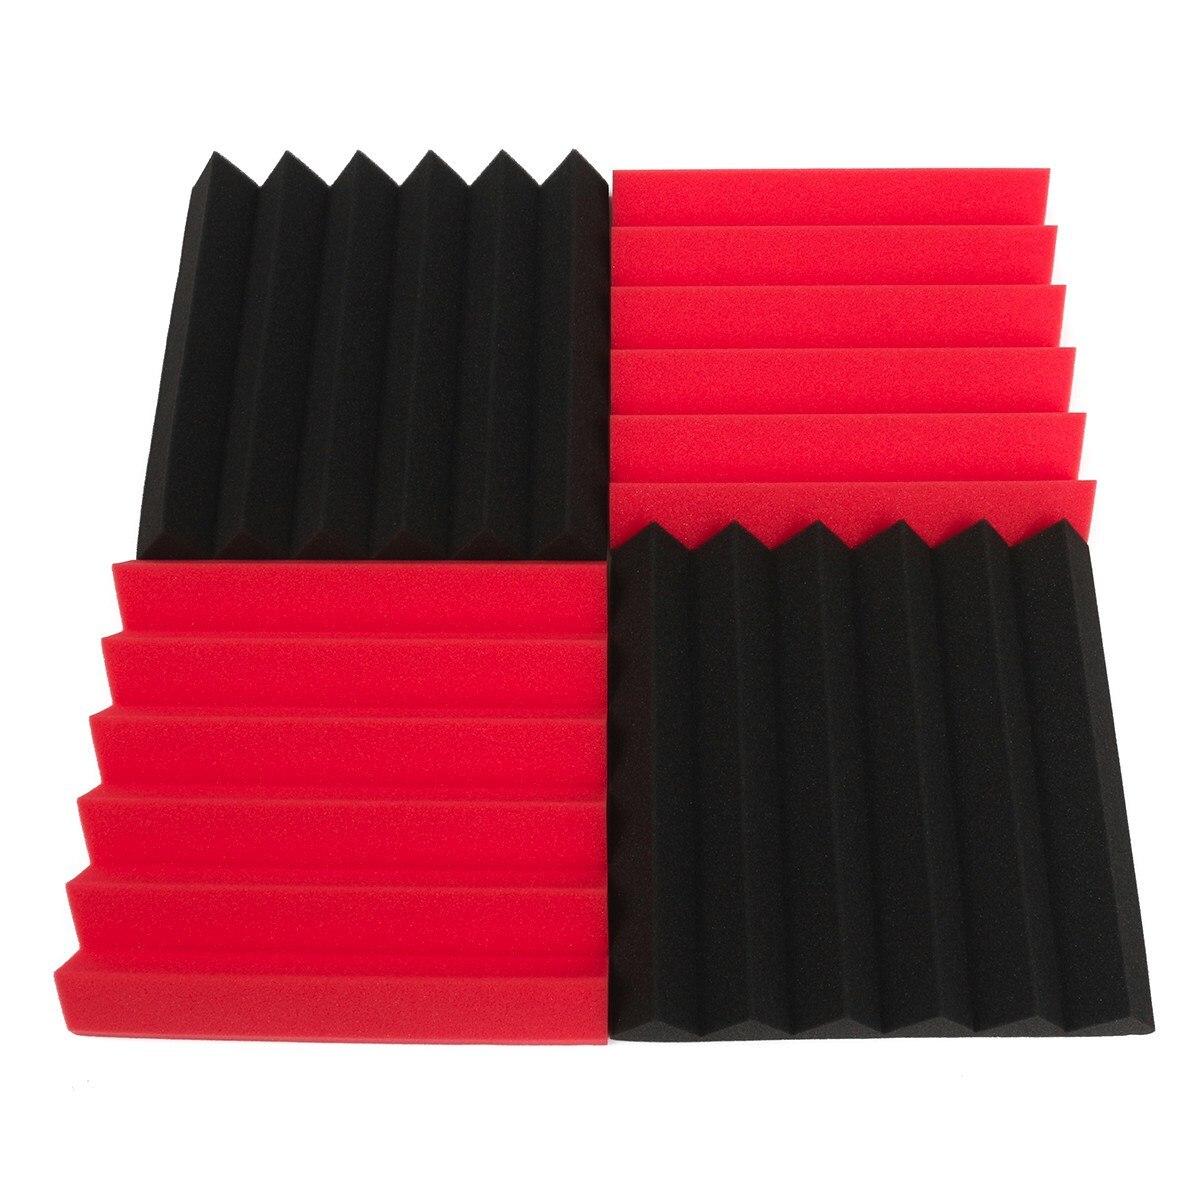 online buy wholesale foam panel from china foam panel wholesalers. Black Bedroom Furniture Sets. Home Design Ideas